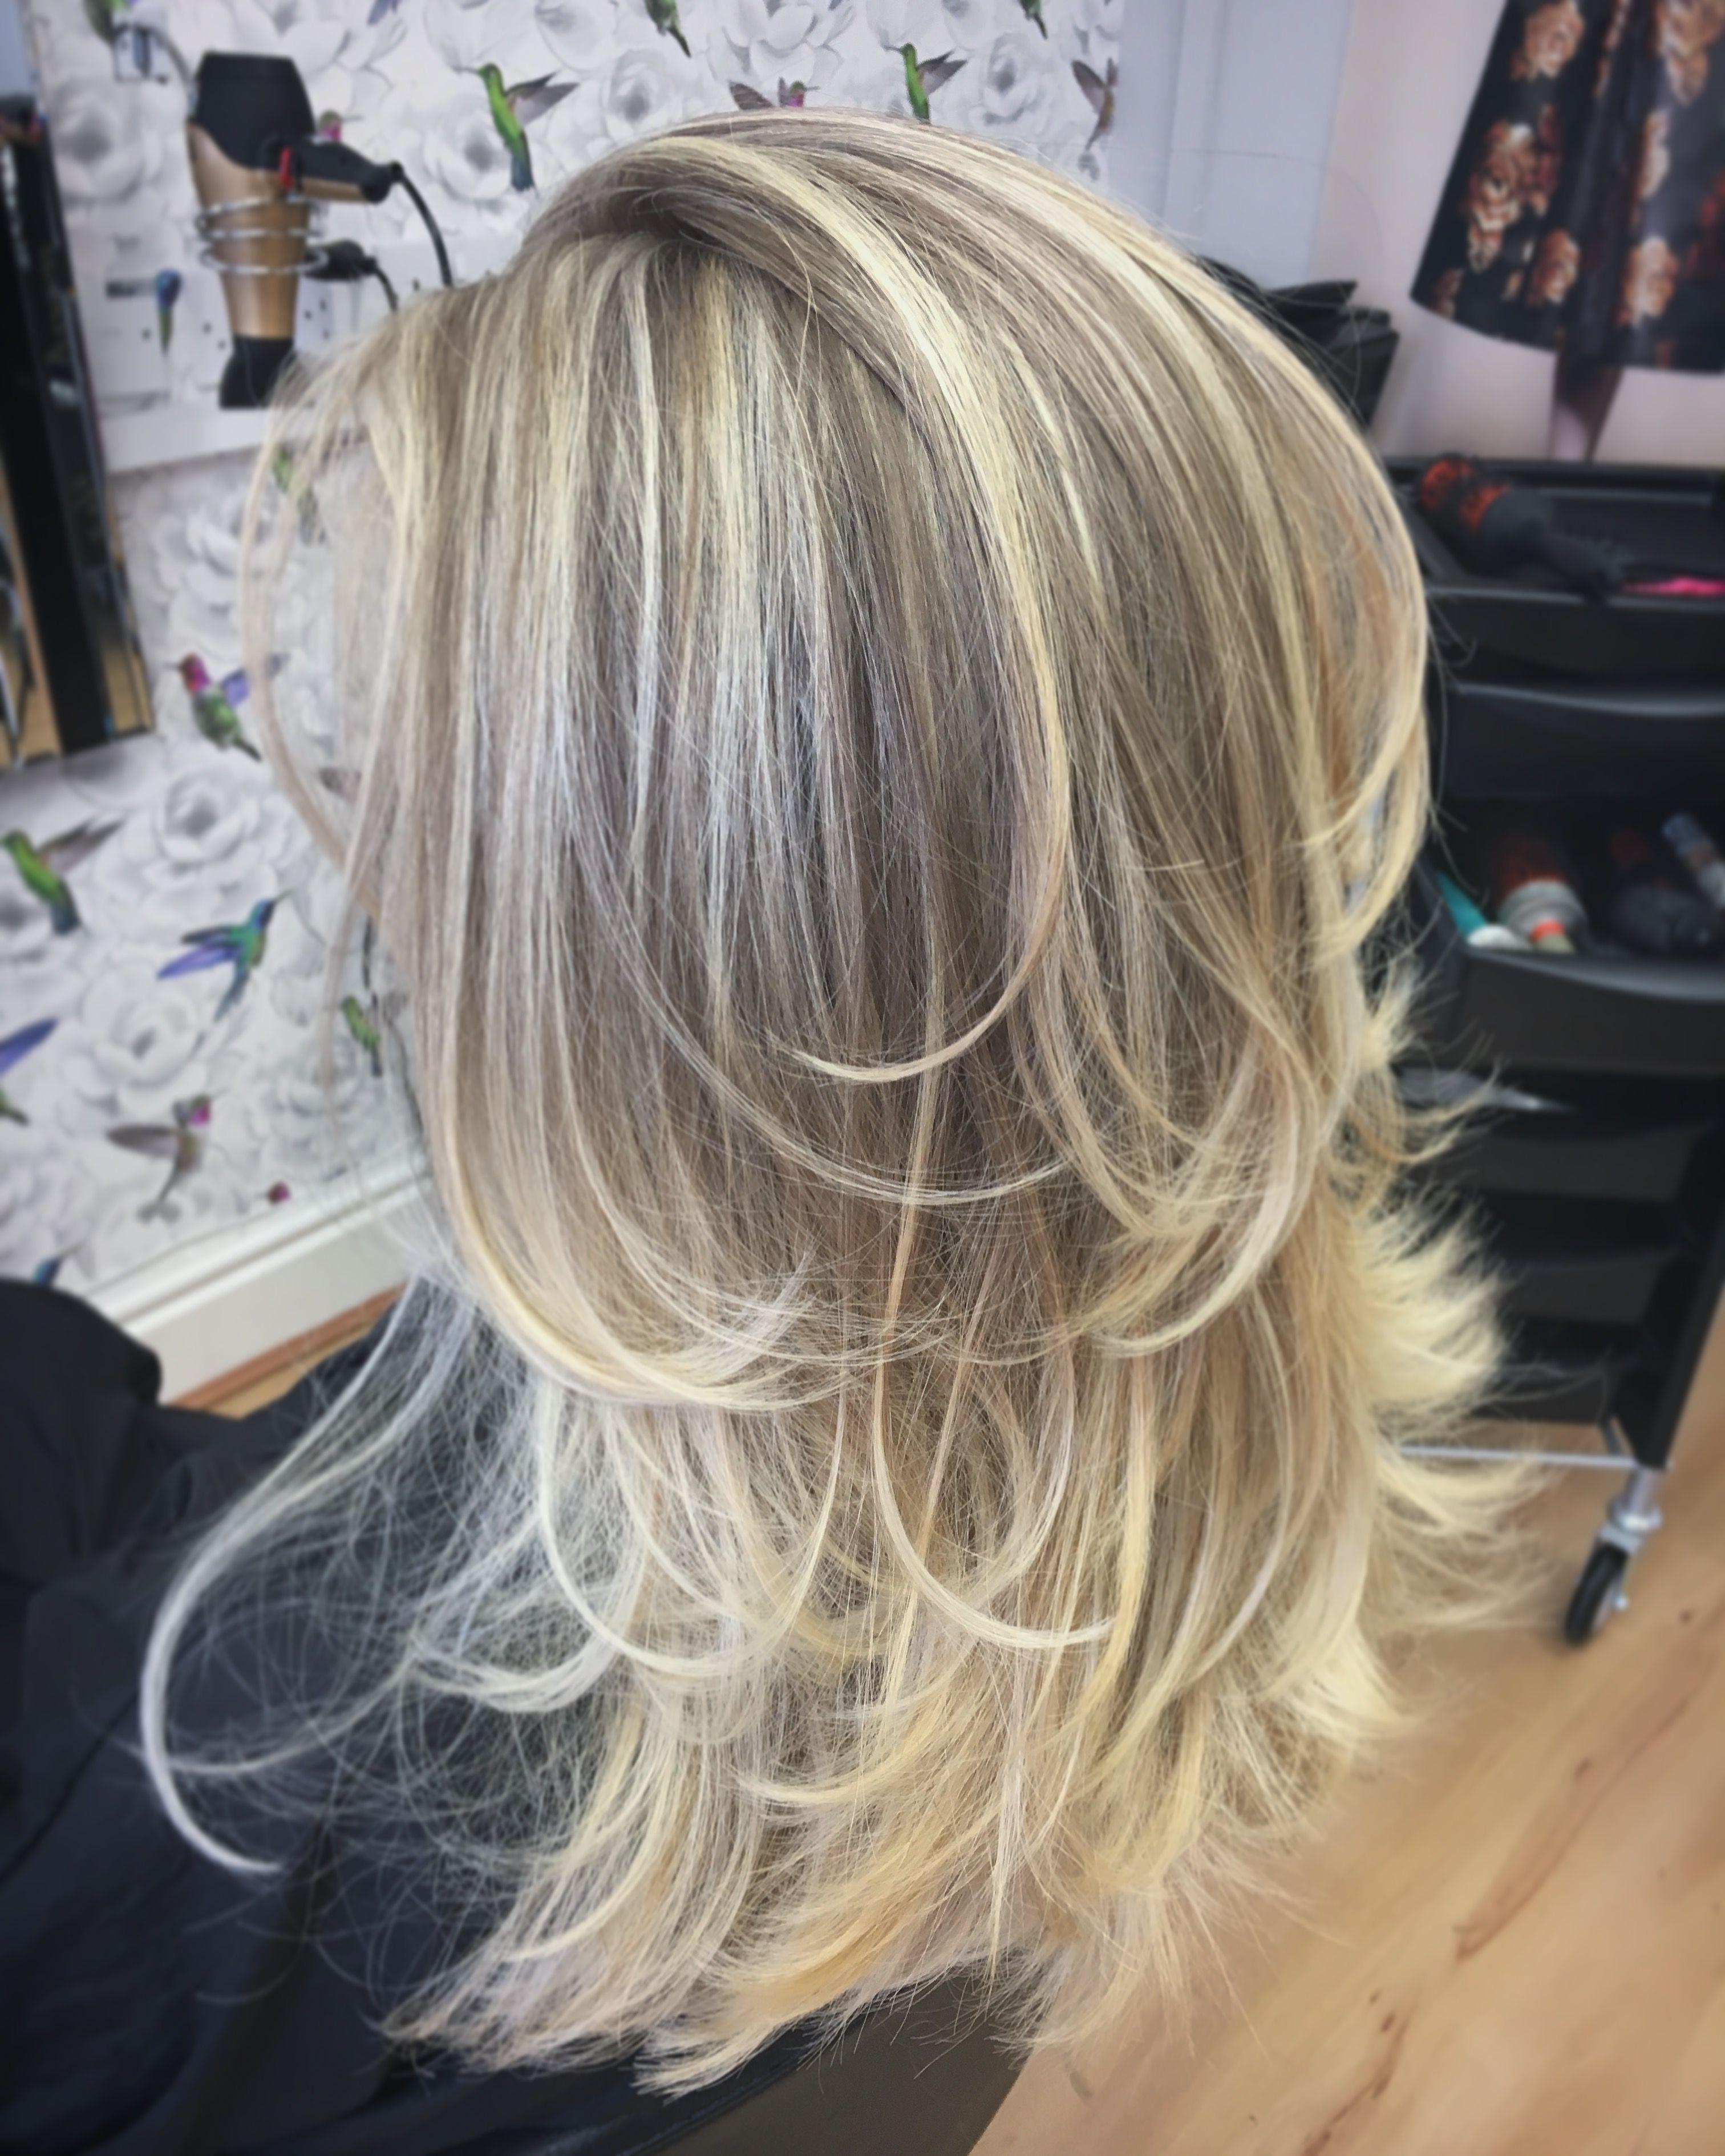 Long Layers Blonde Balayage Blonde Highlights Ash Blonde Layers Ombre Long Hair Styles Blonde Balayage Balayage Hair Caramel